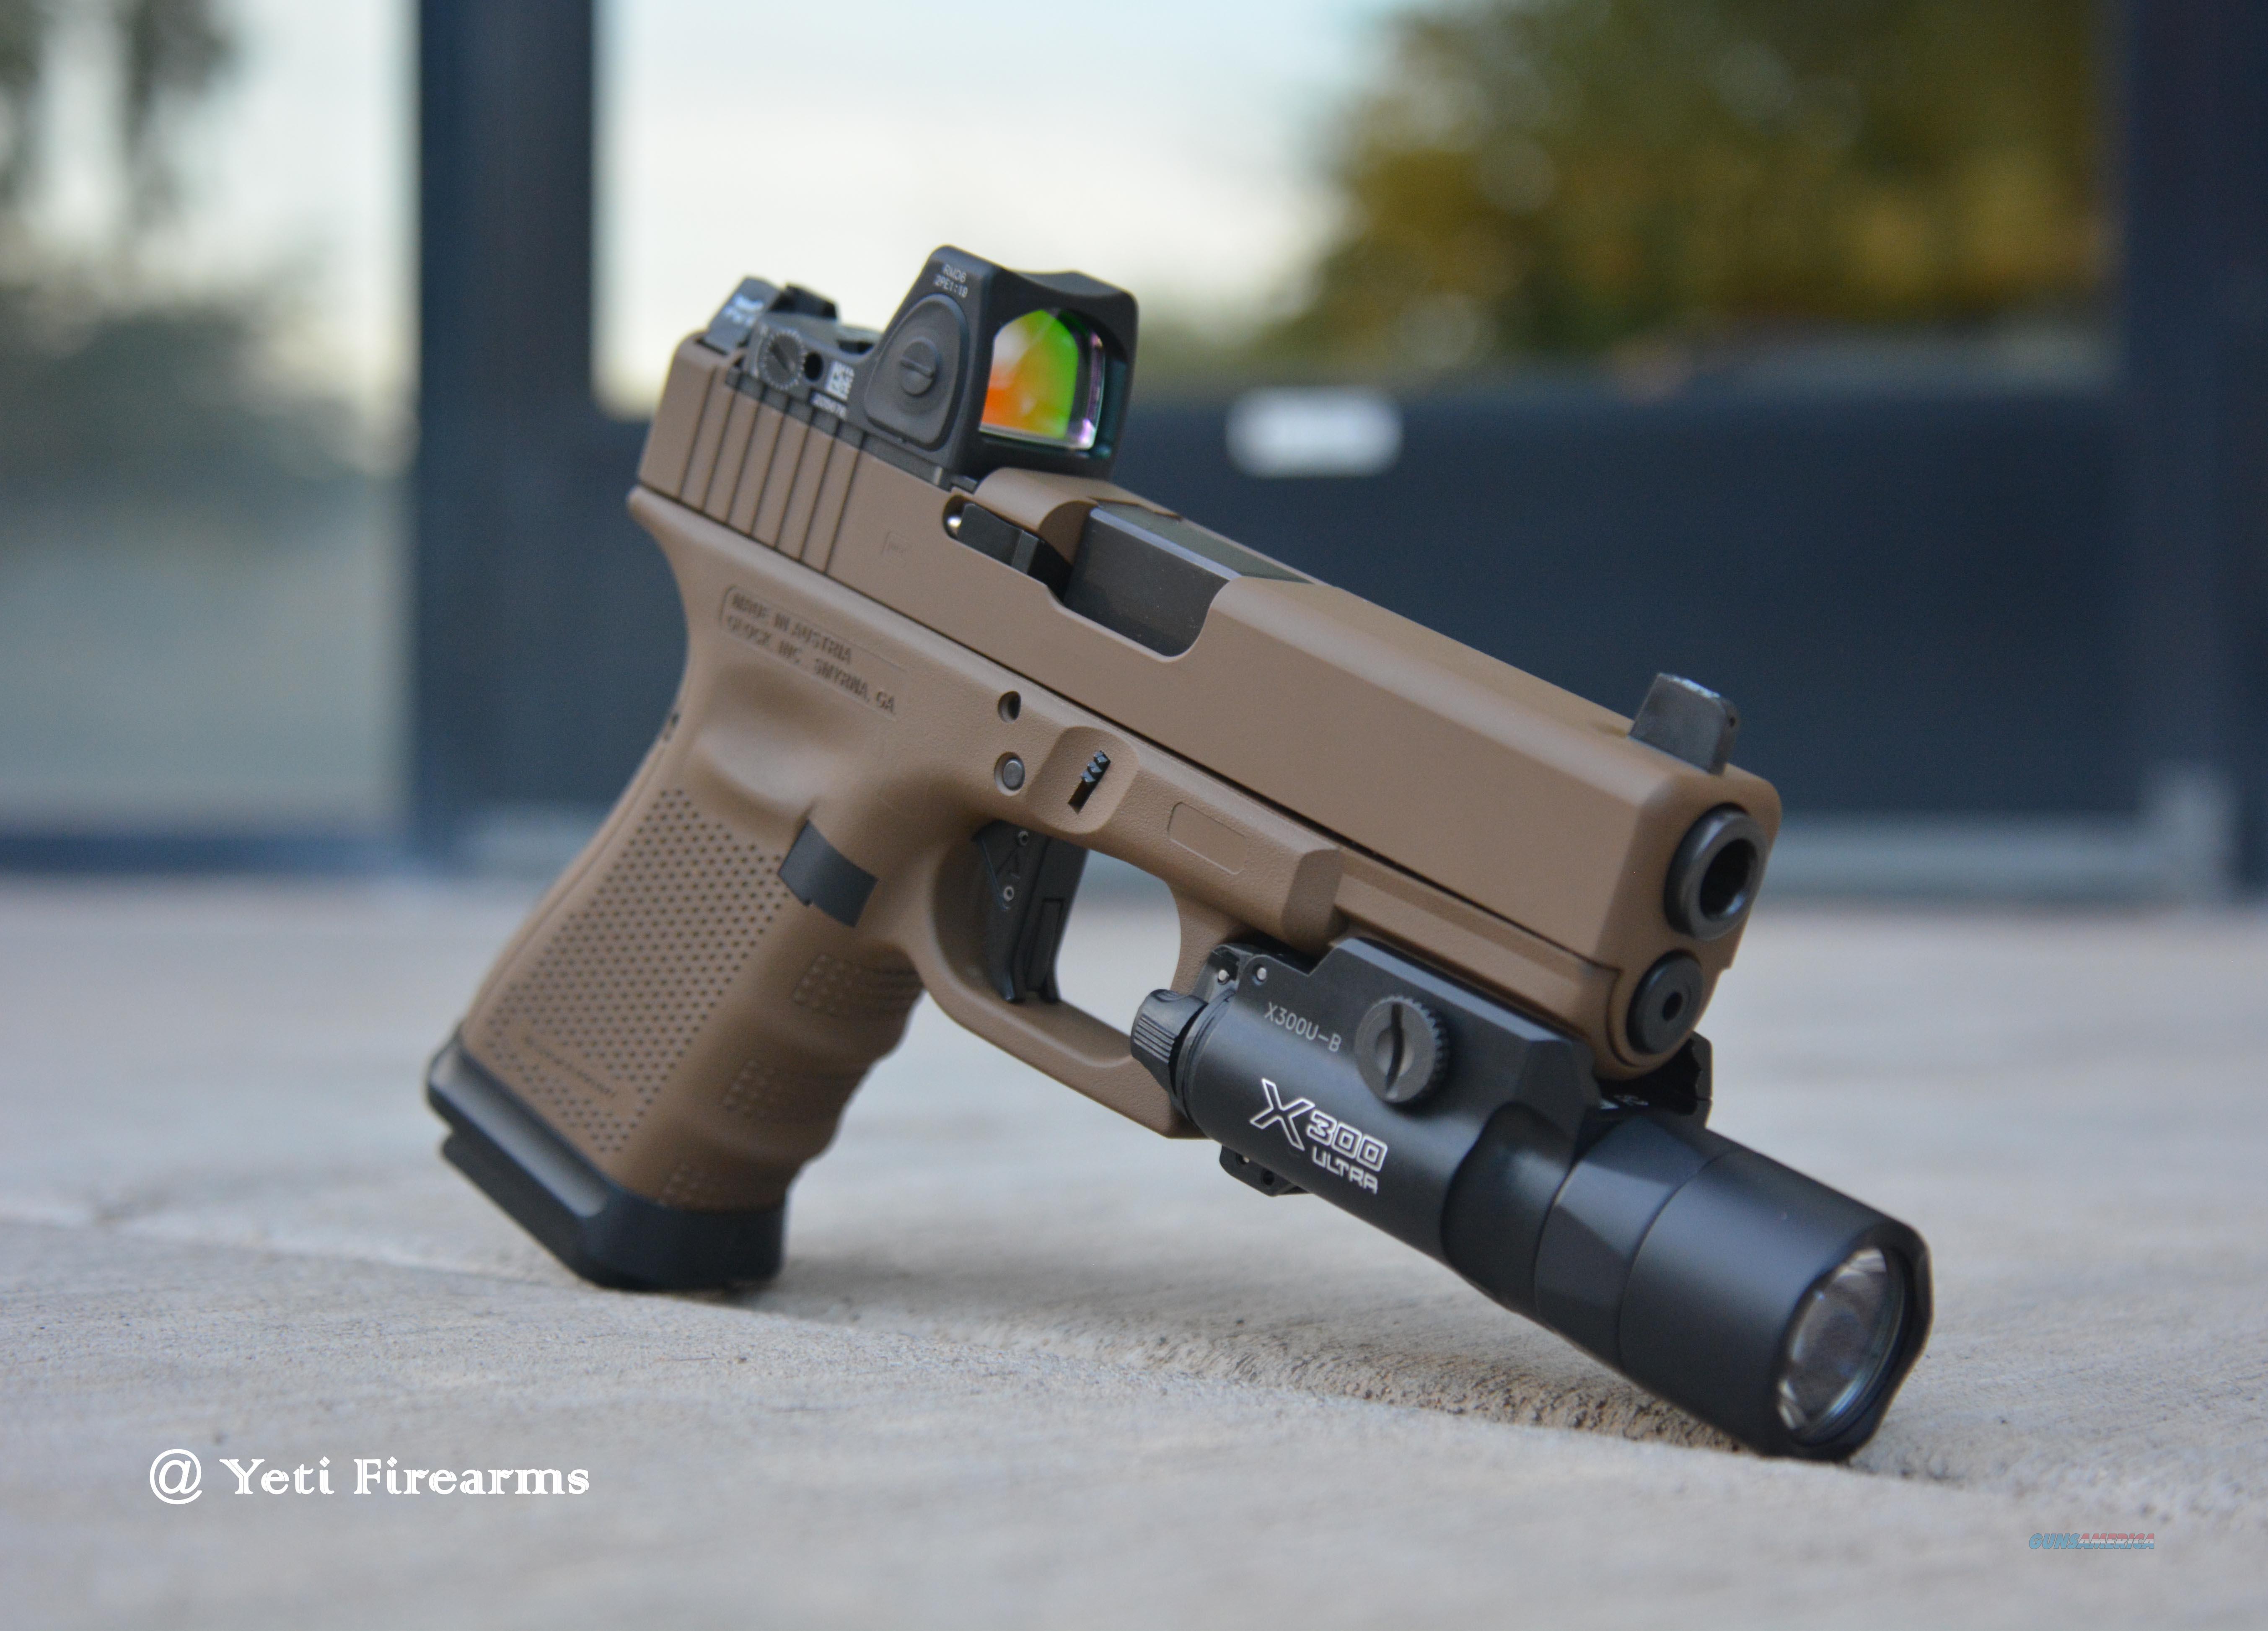 X-Werks Glock 19 G4 MOS 9mm Glock FDE 15rnd